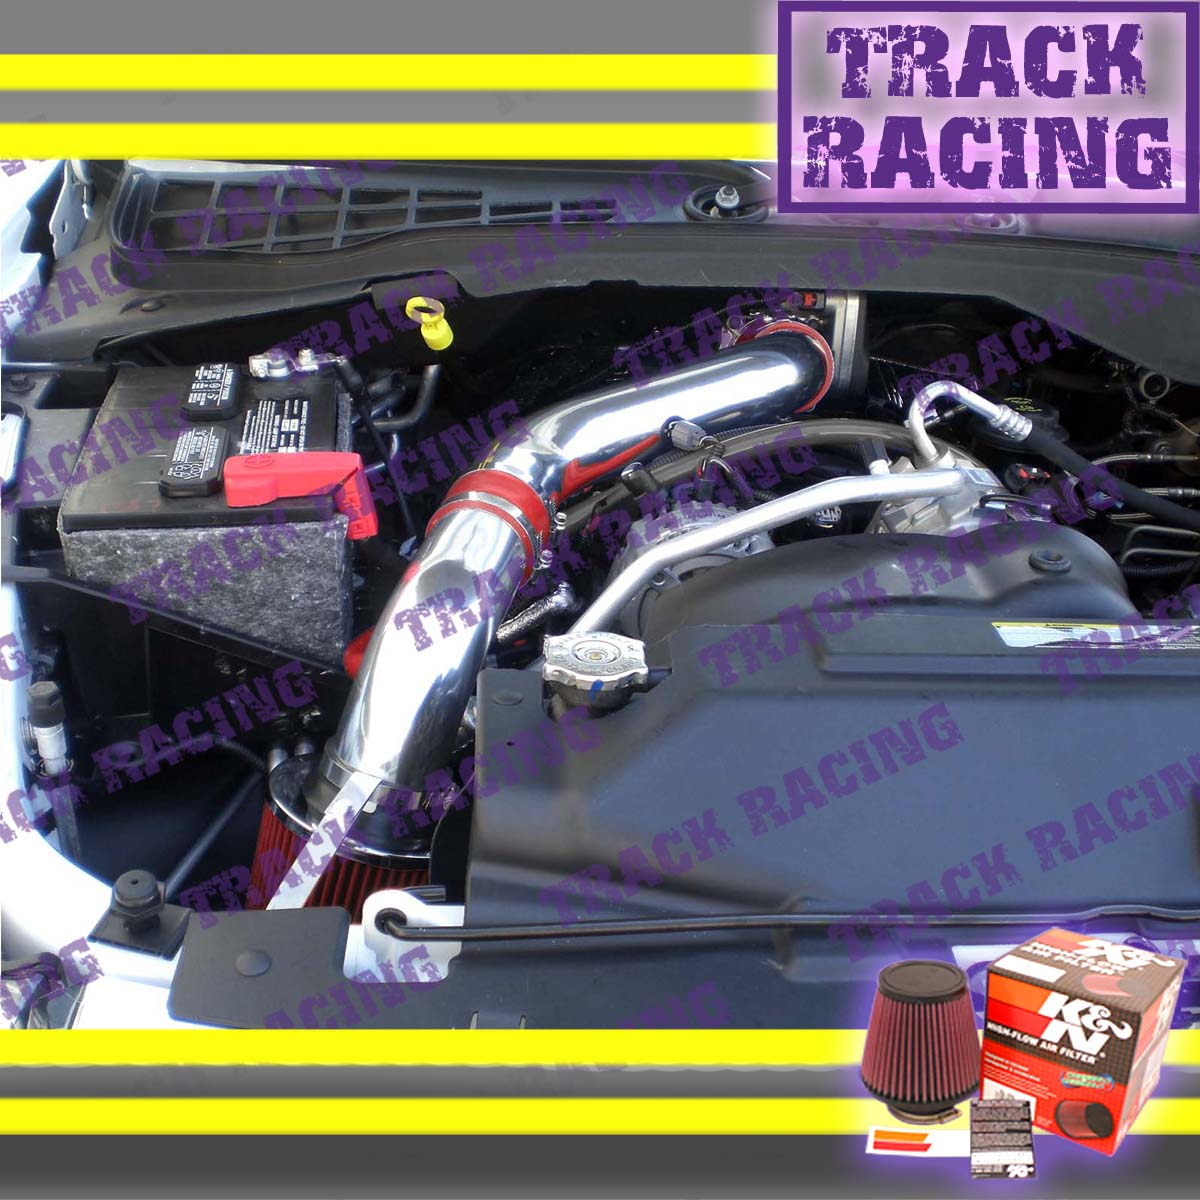 RED 04 05 06 07 08//2004-2008 DODGE DURANGO 5.7 5.7L V8 COLD AIR INTAKE KIT